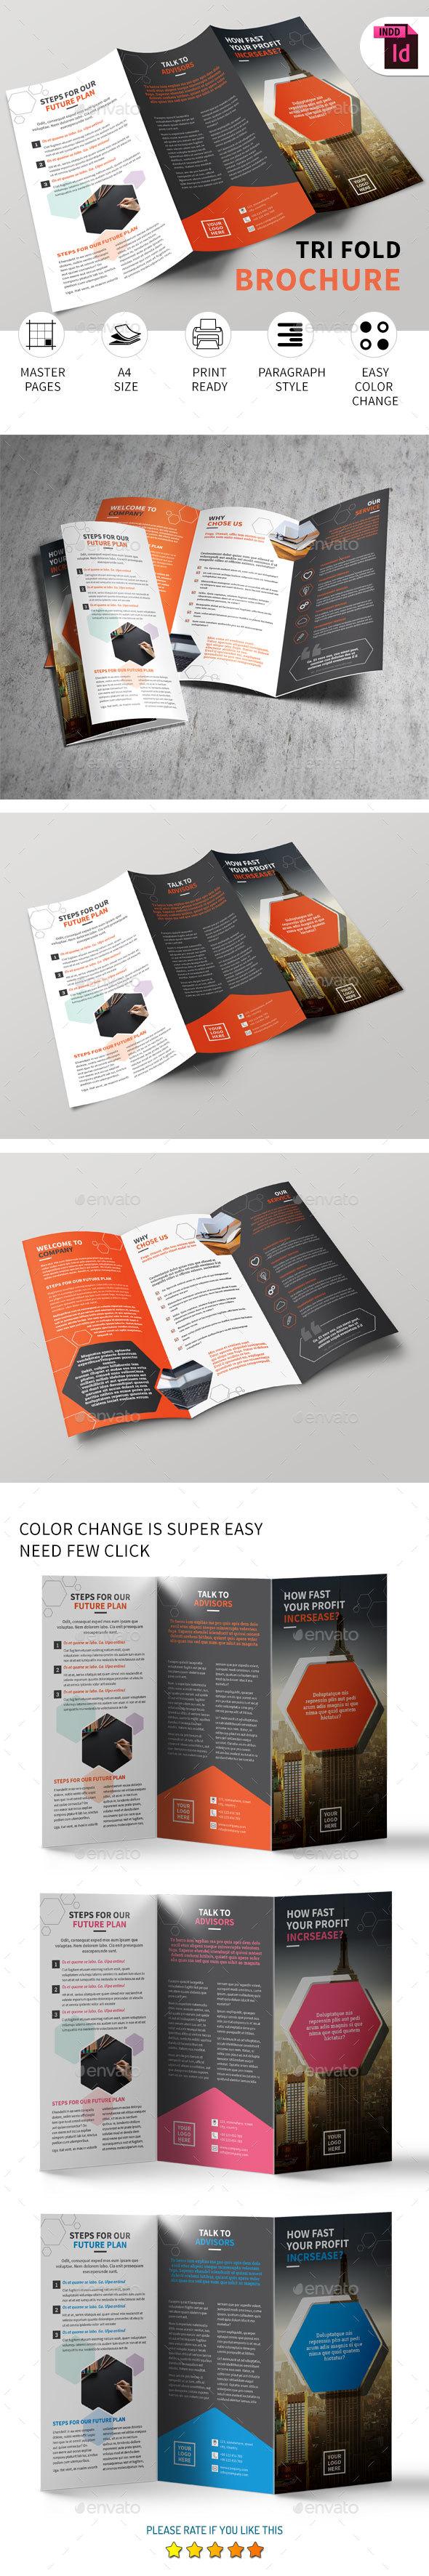 Tri-fold Brochure Vol-11 - Corporate Brochures